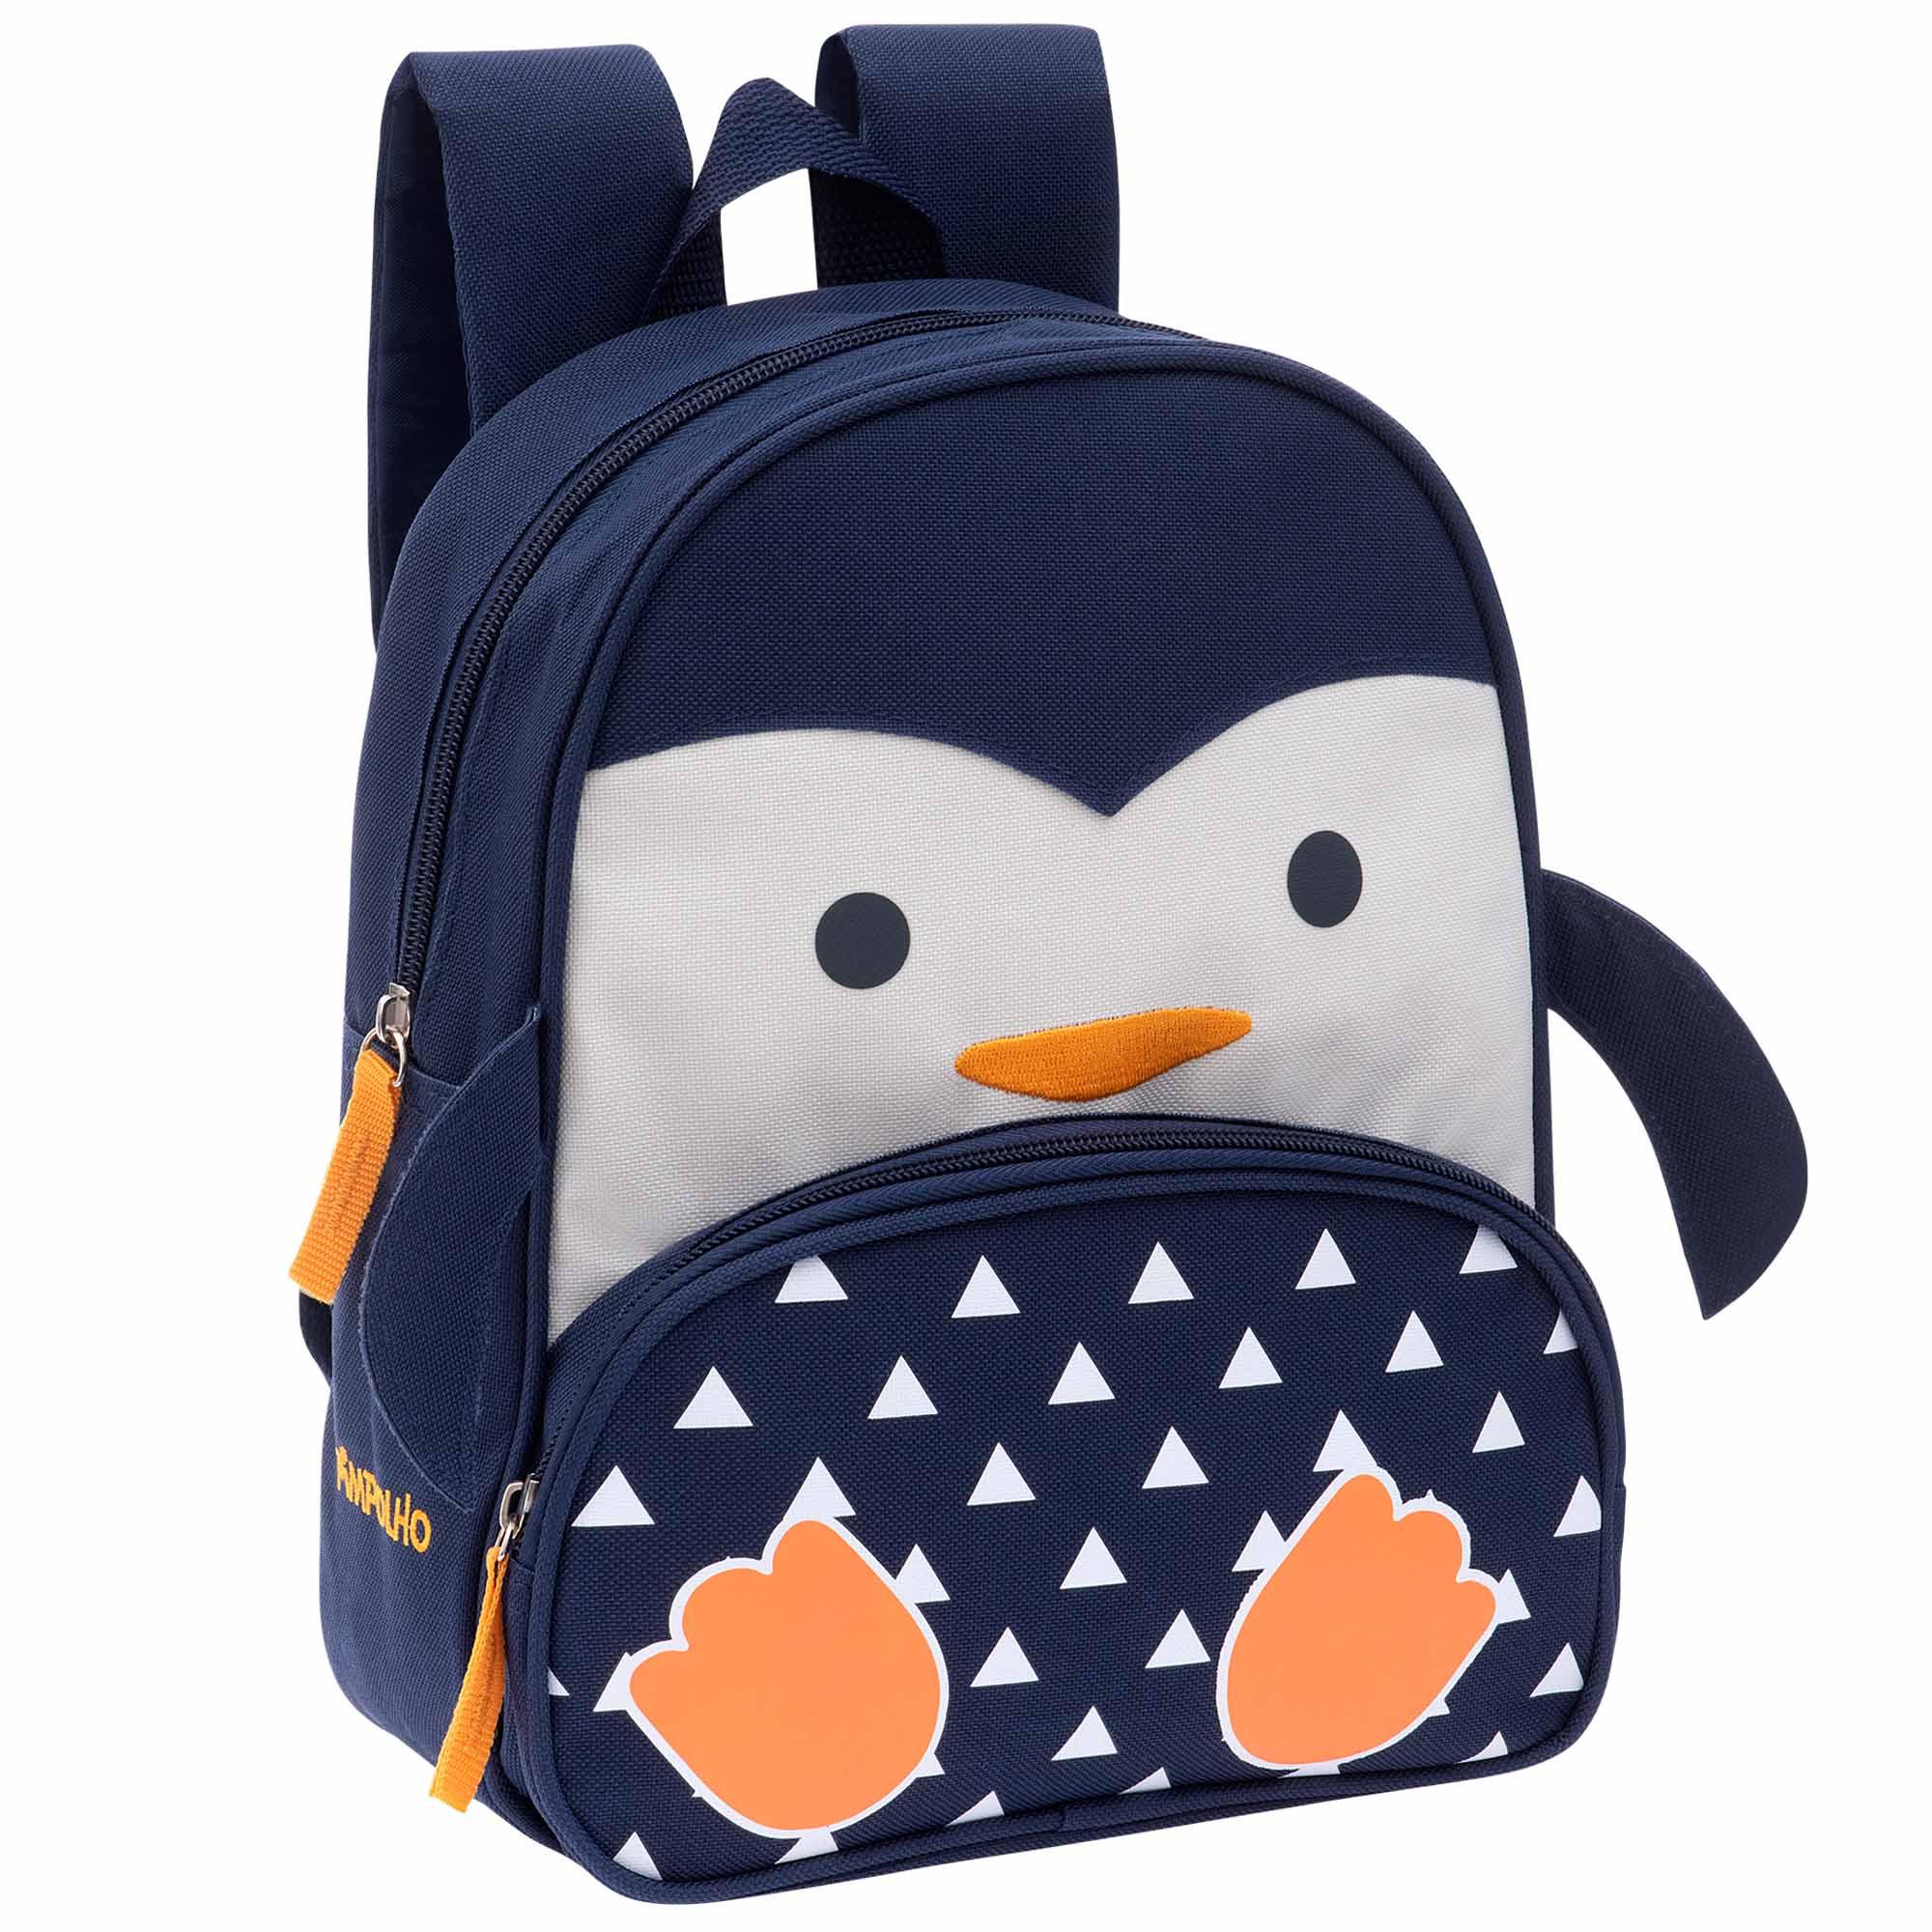 Mochila Pimpolho Bichinhos - Pinguim